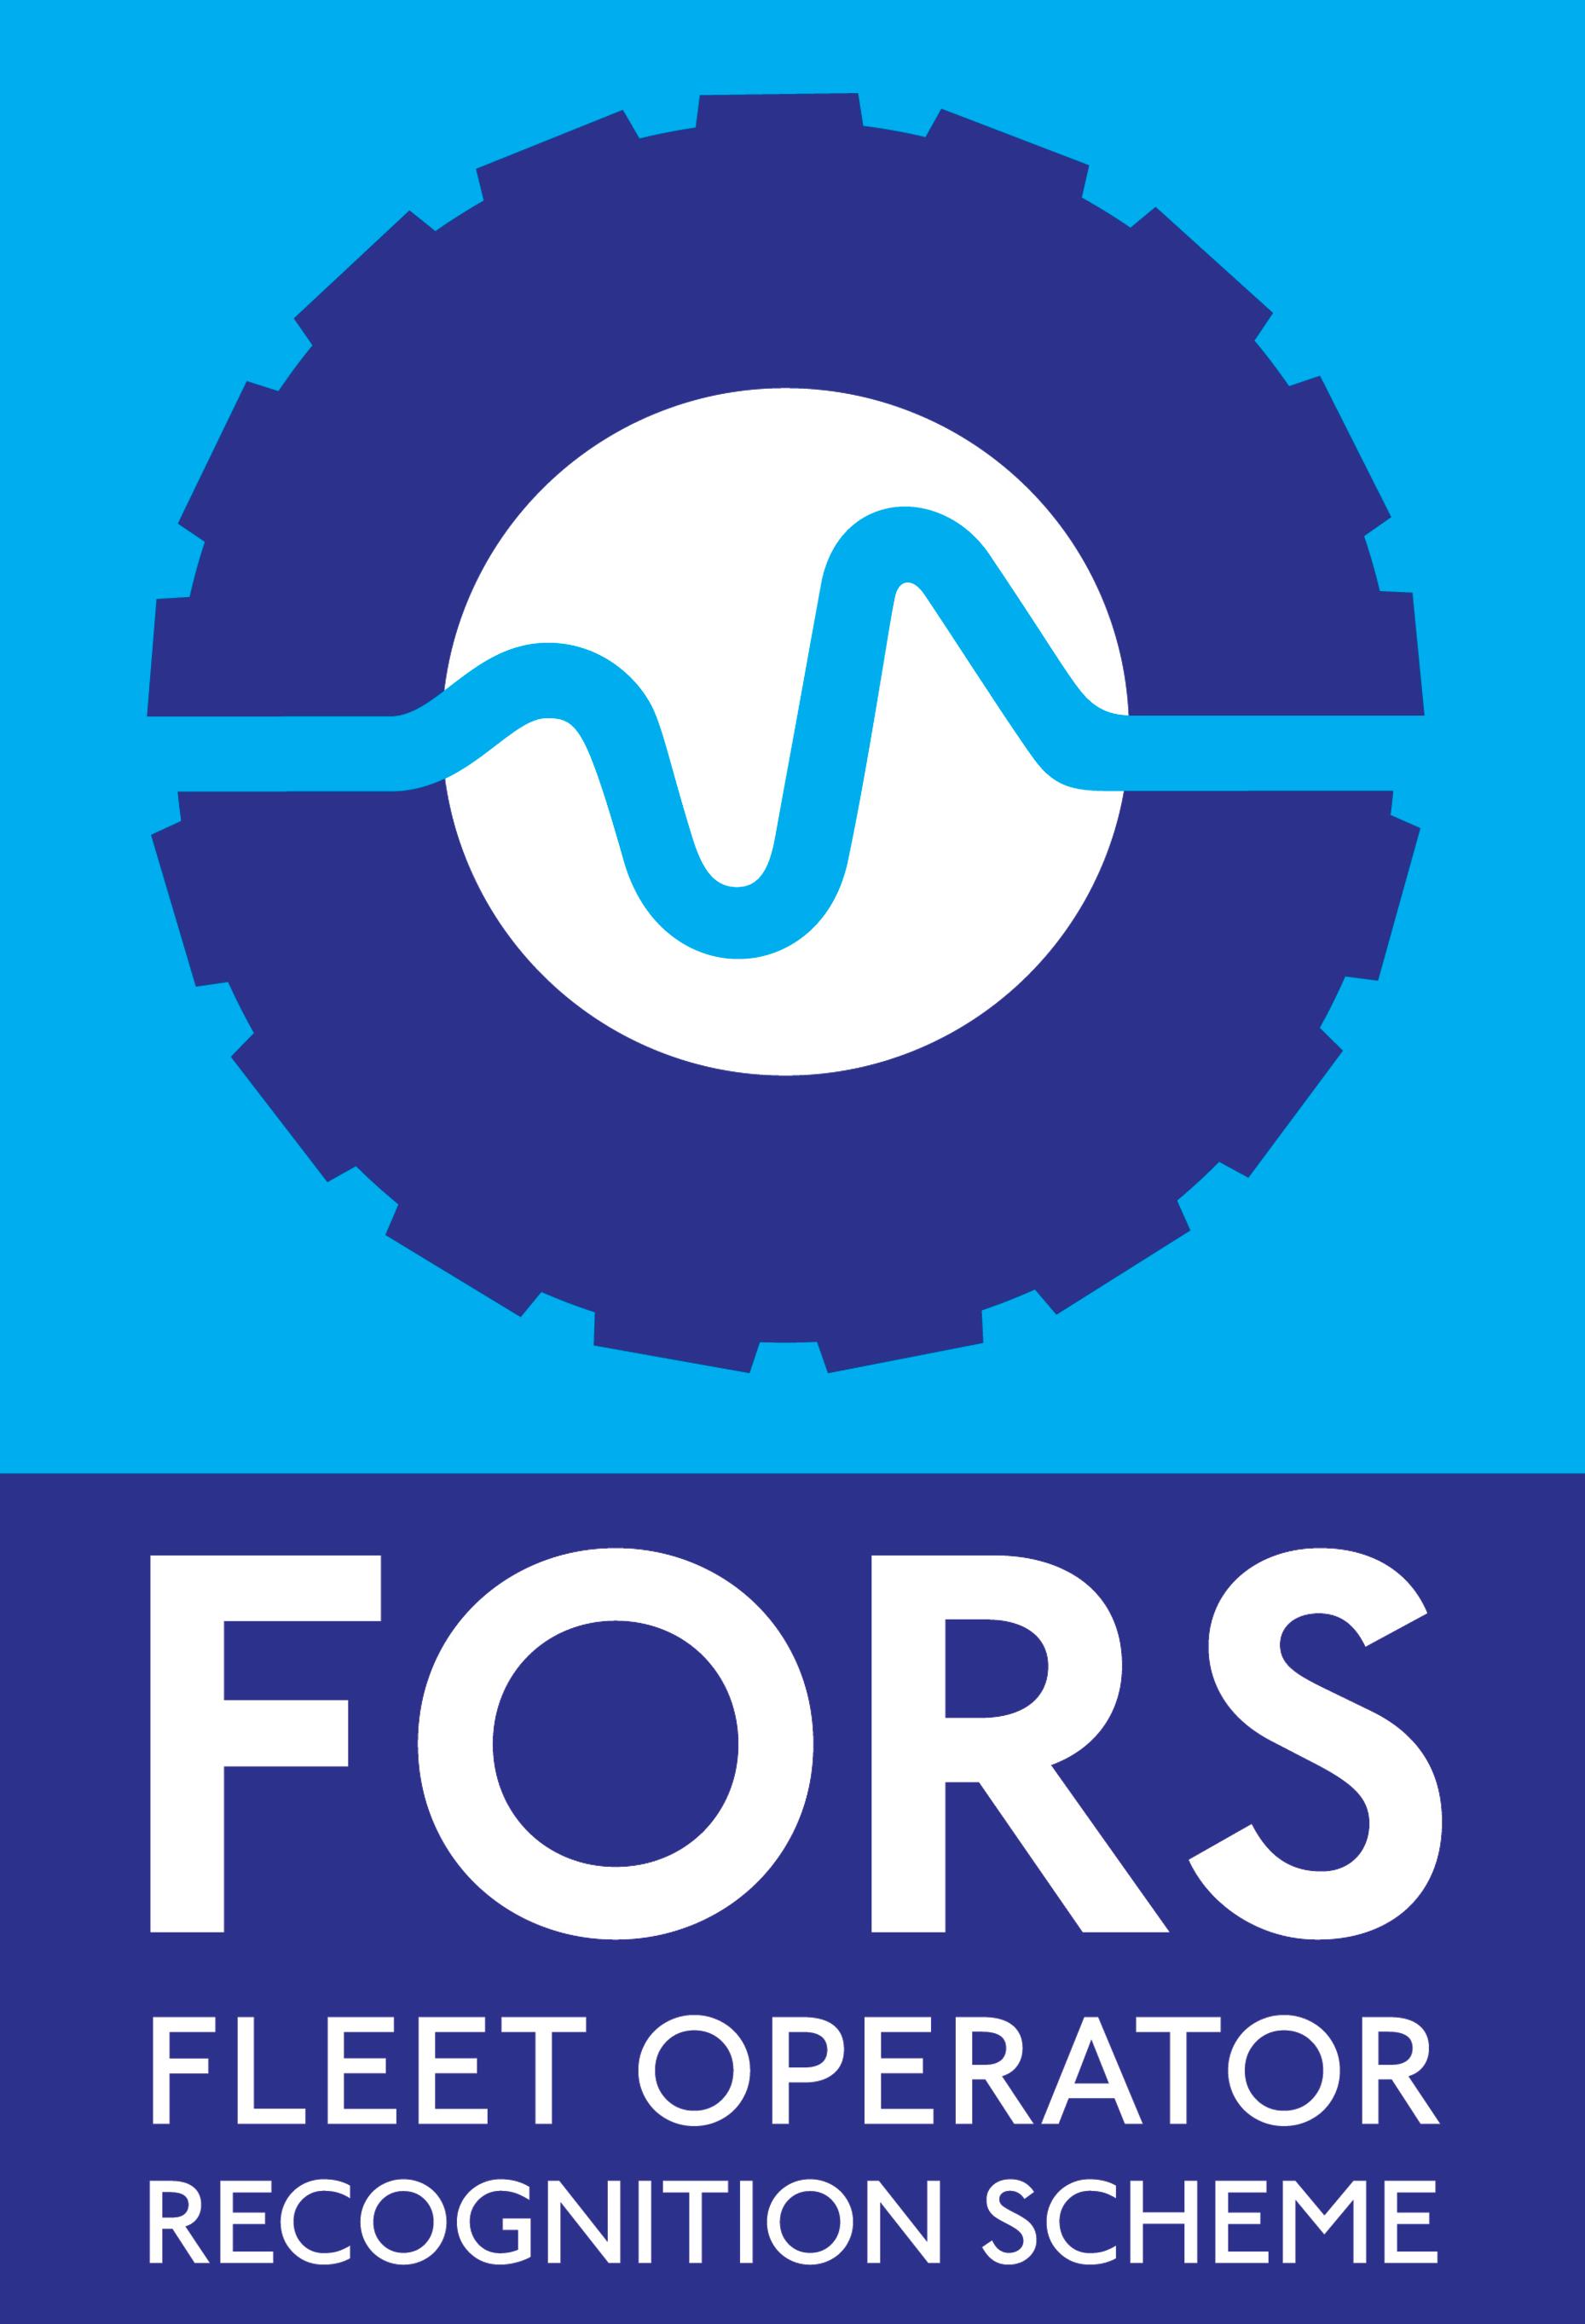 FORS Fleet Operation Recognition Scheme